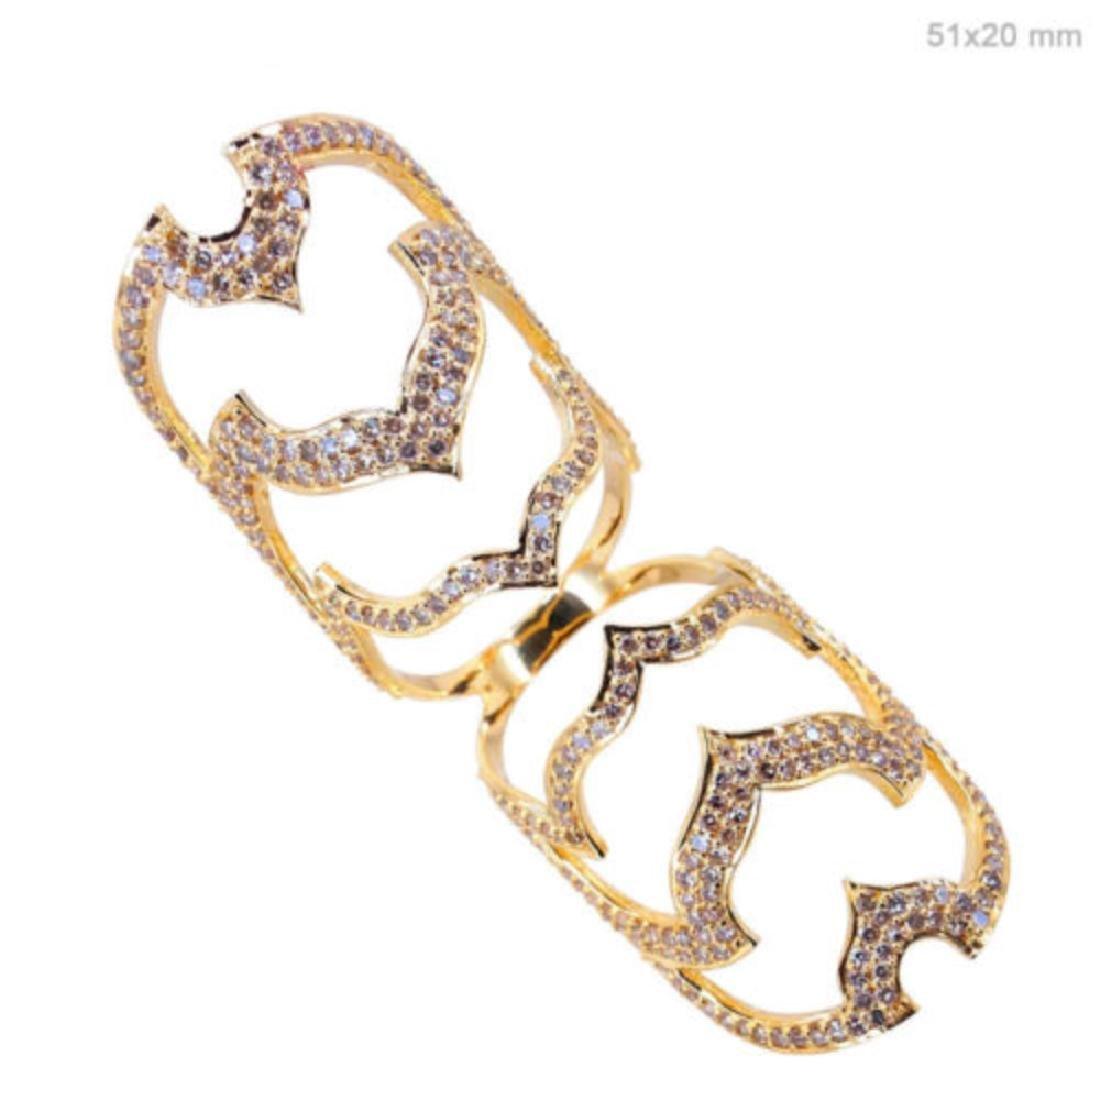 18k Yellow Gold 1.97 Ct Natural Diamond Pave Ring